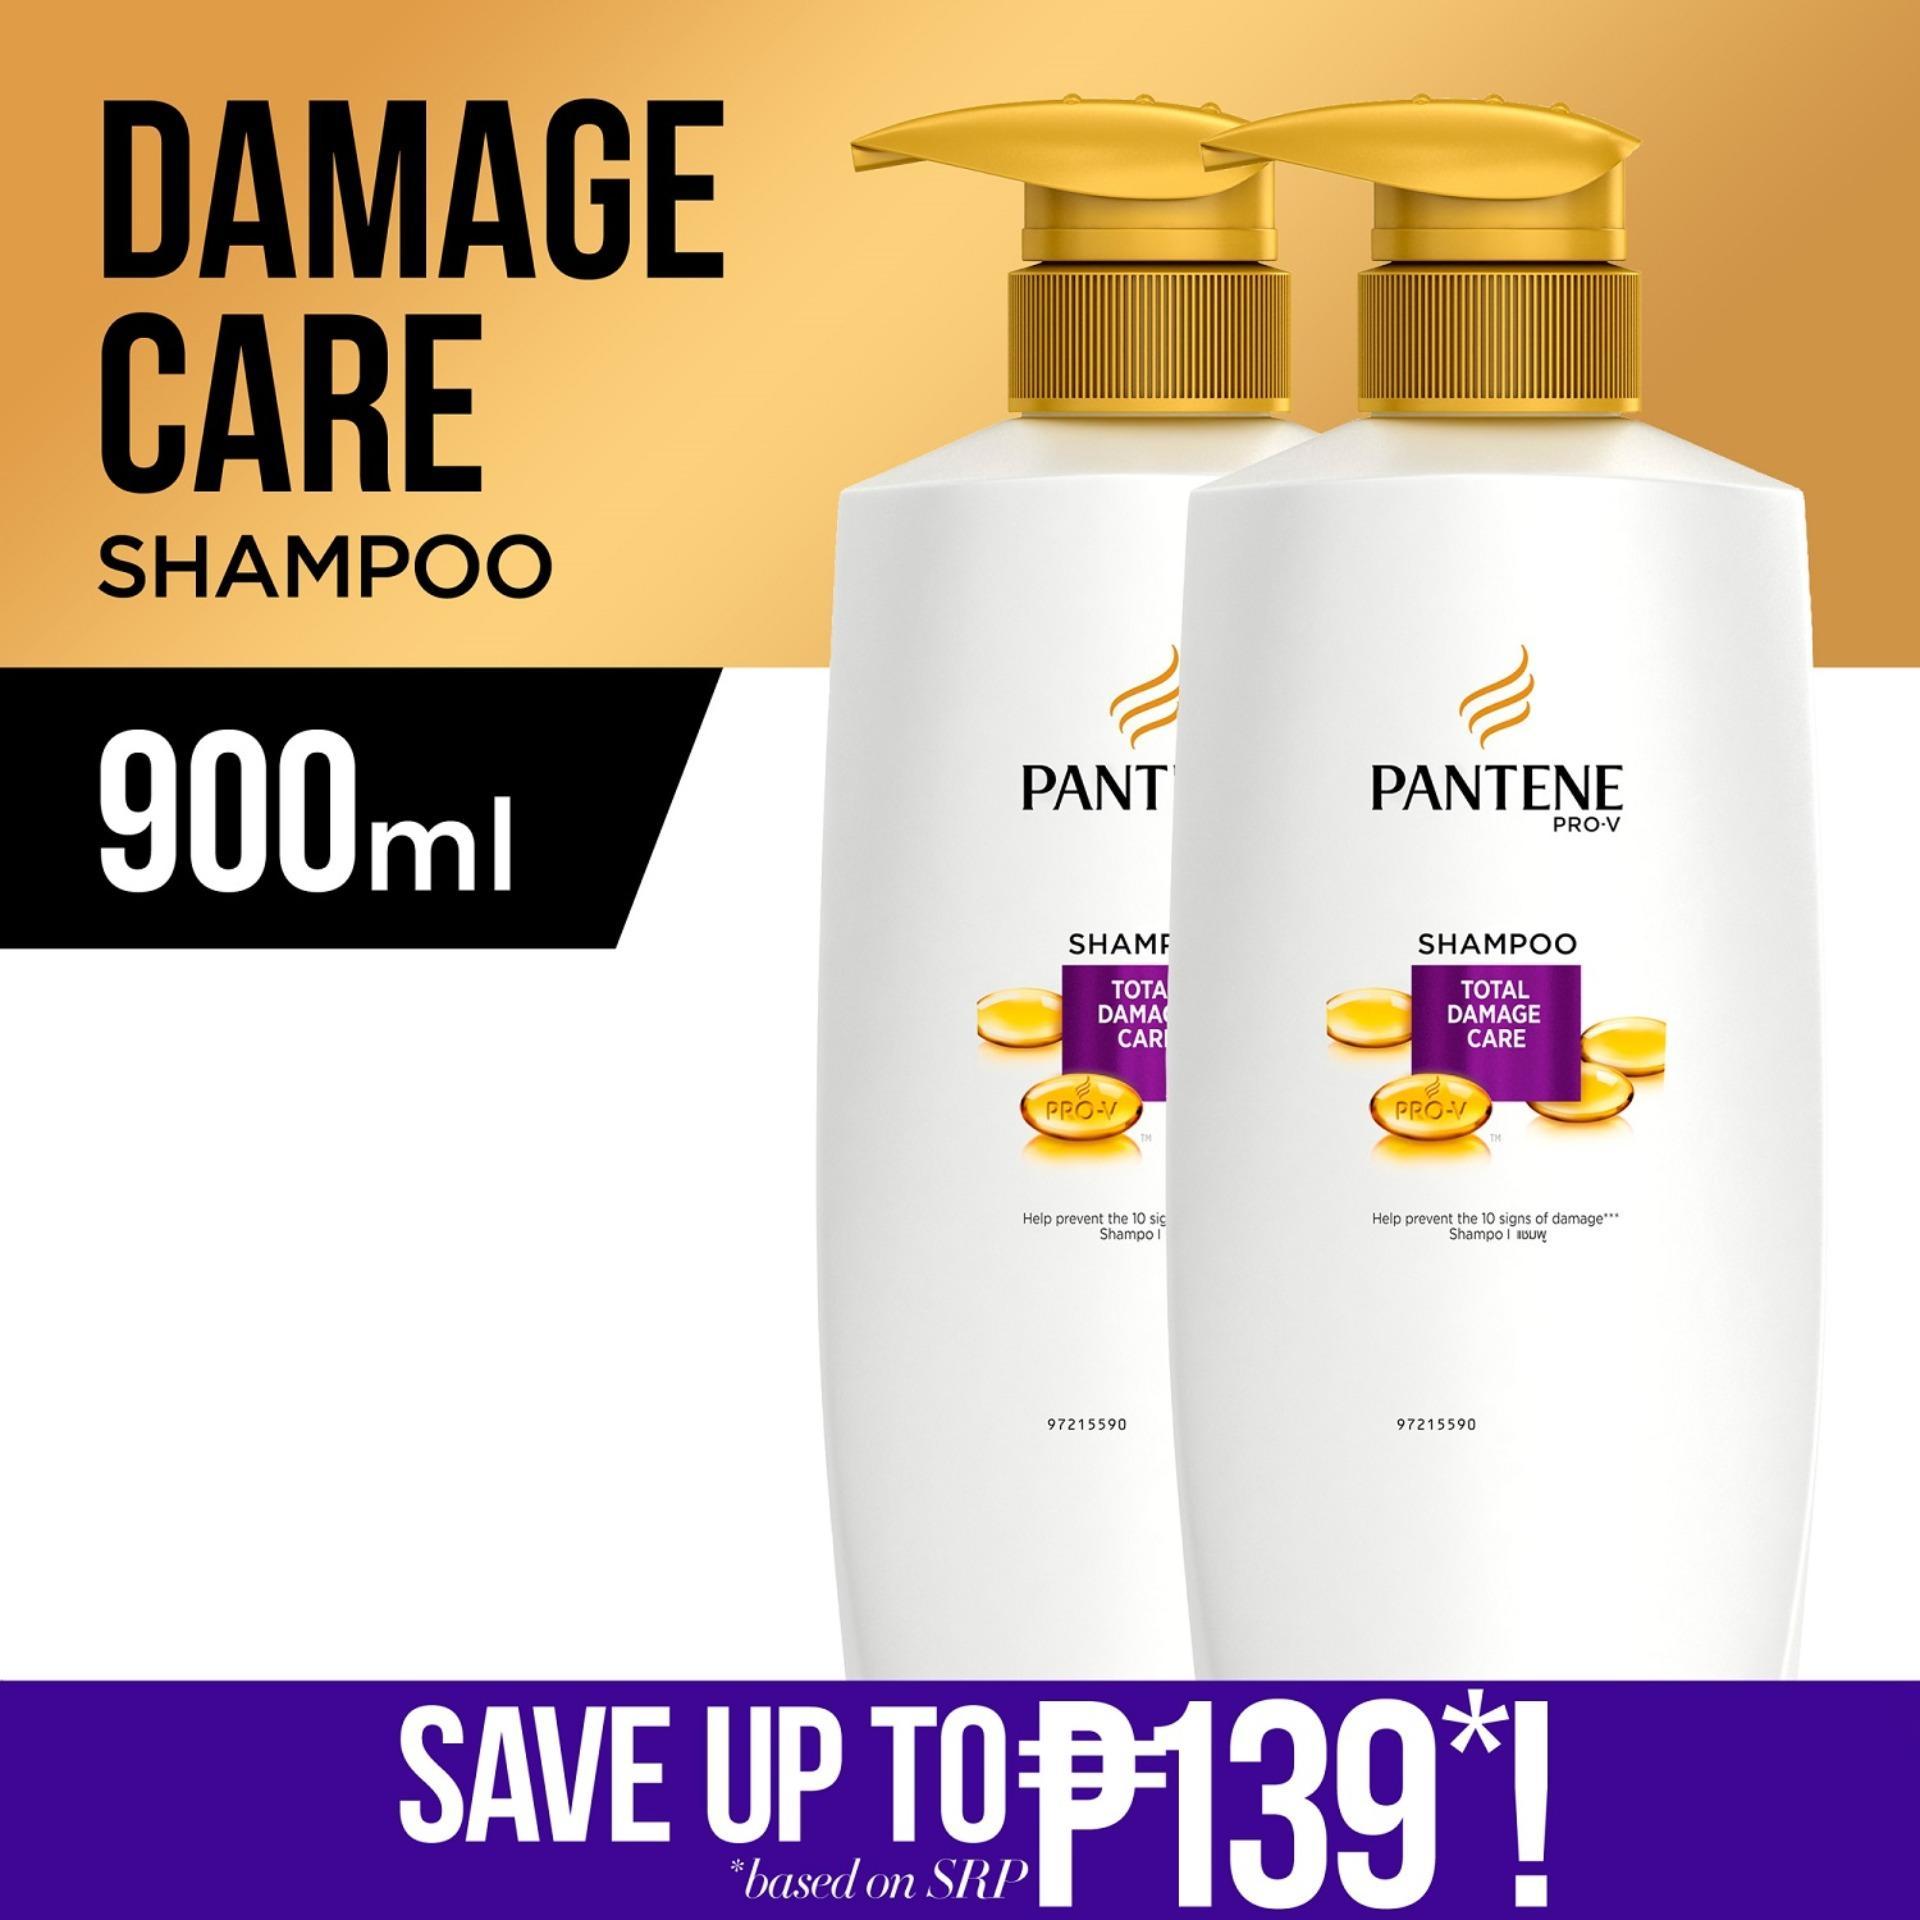 [BUY 2 @ 20% OFF] Pantene Total Damage Care Shampoo 900mL